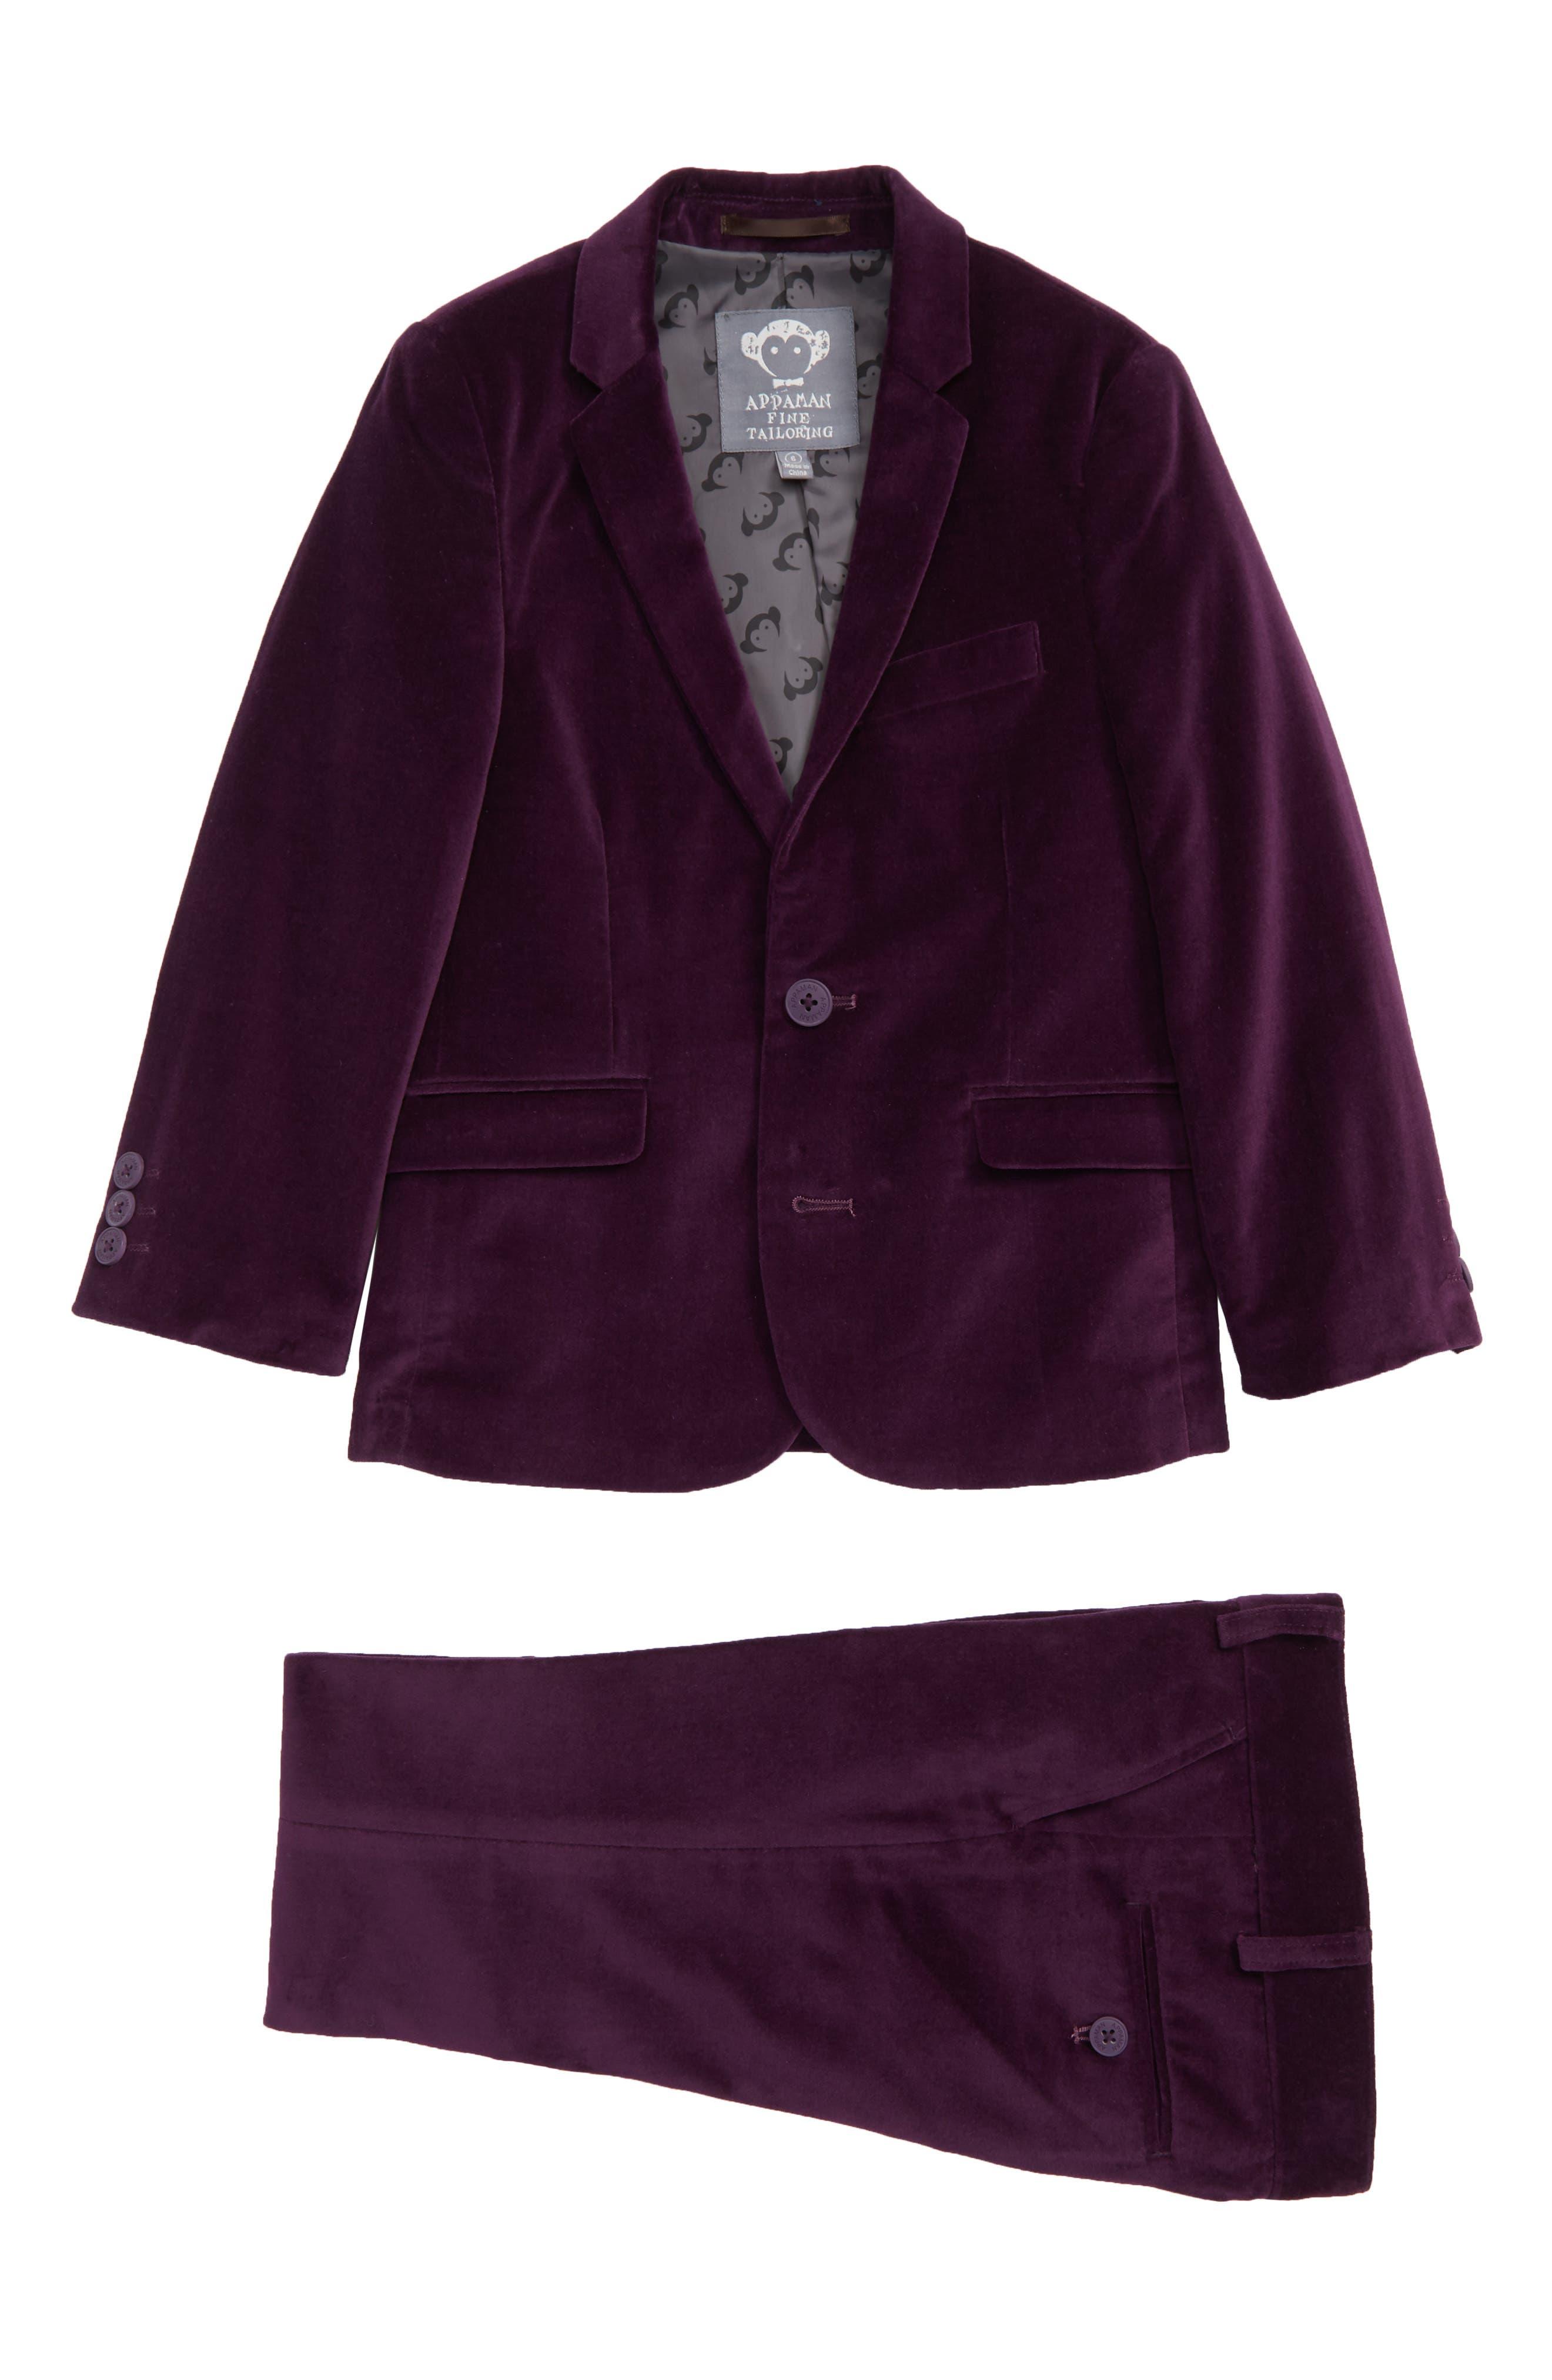 Toddler Boys Appaman Mod TwoPiece Velveteen Suit